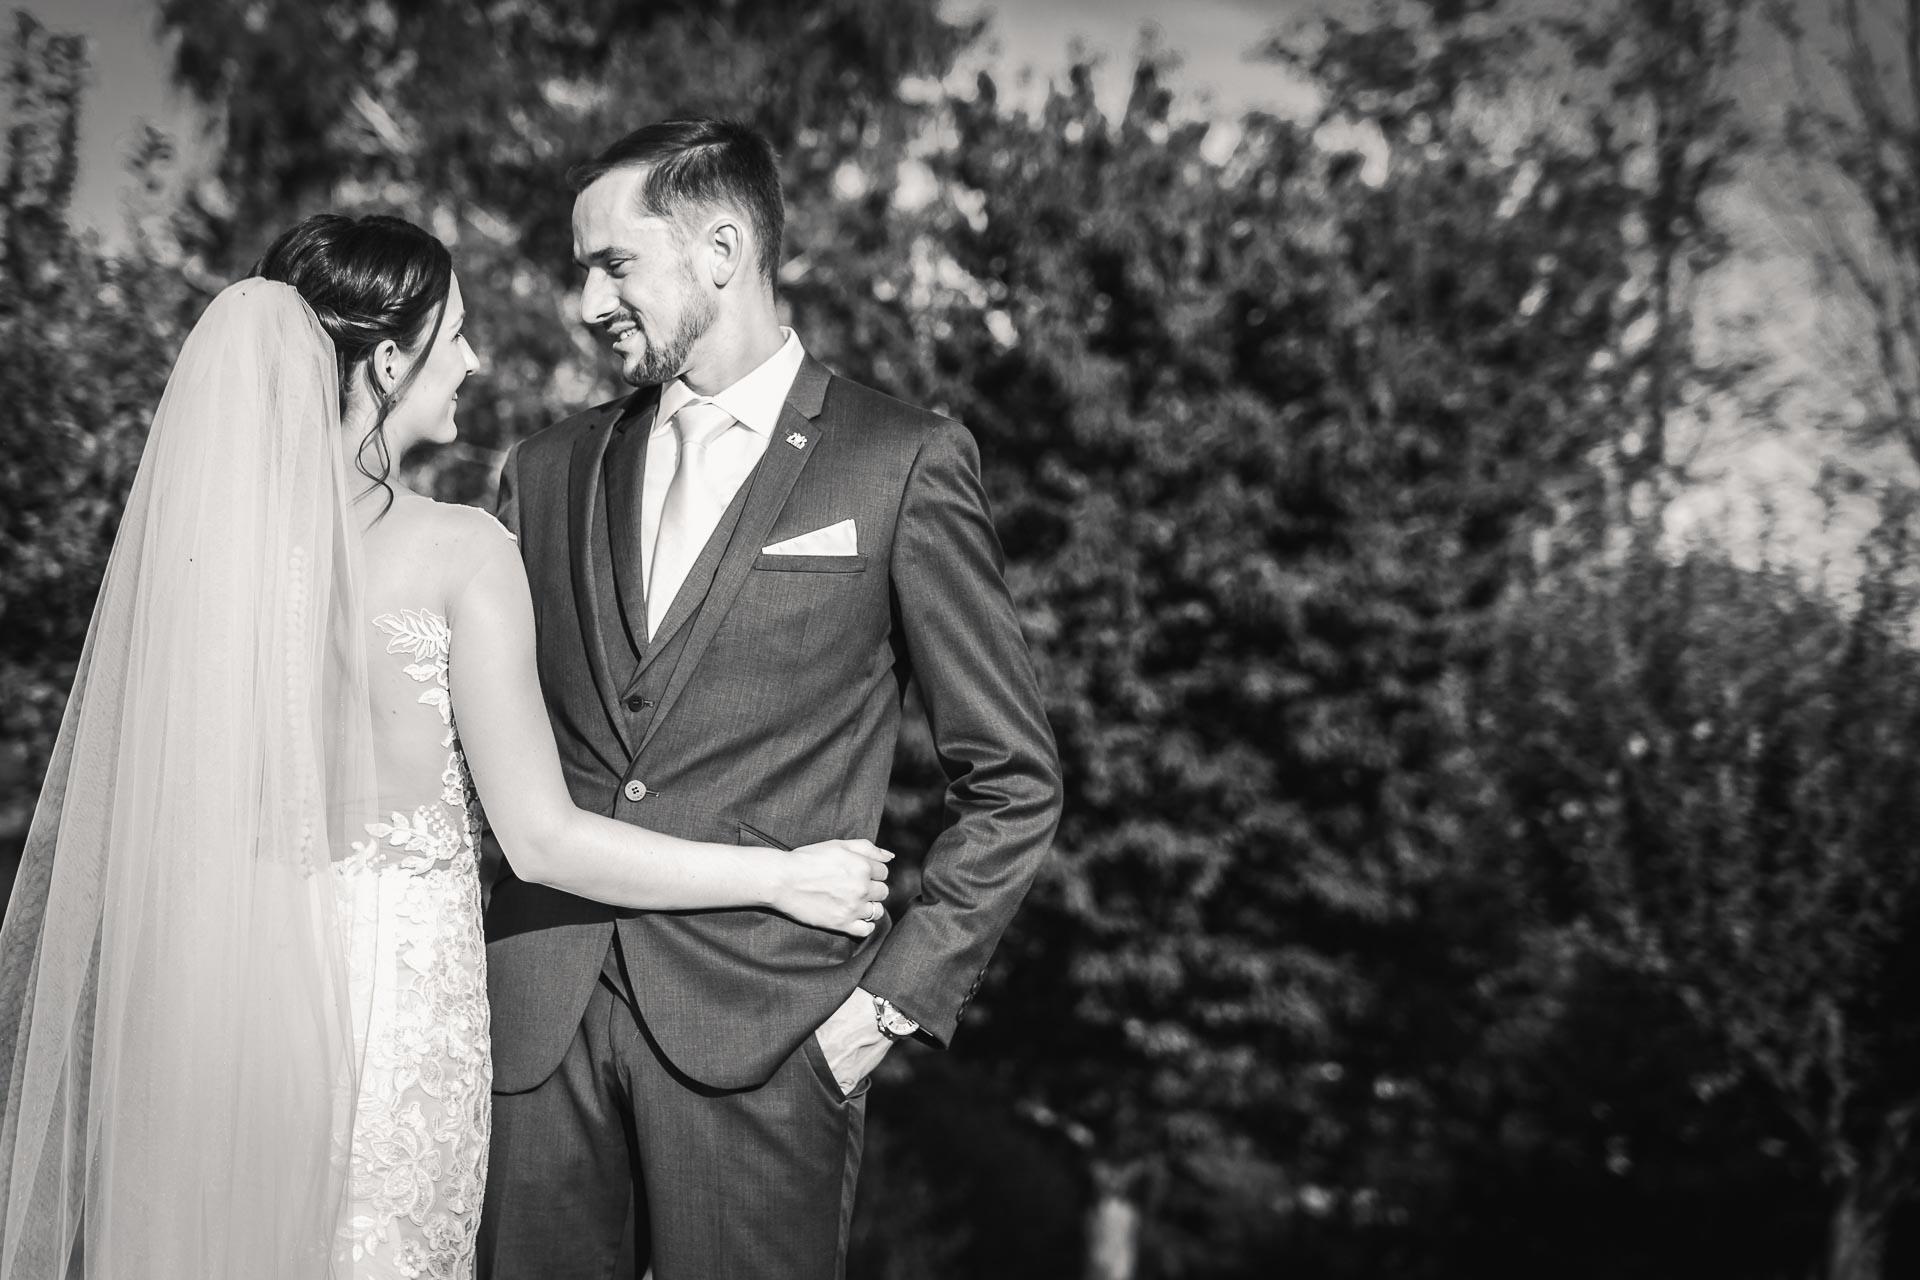 svatební-fotograf-wedding-svatebni-video-orlík-vltava-kostel-statek-stodola-boho-svatba-Beautyfoto-507